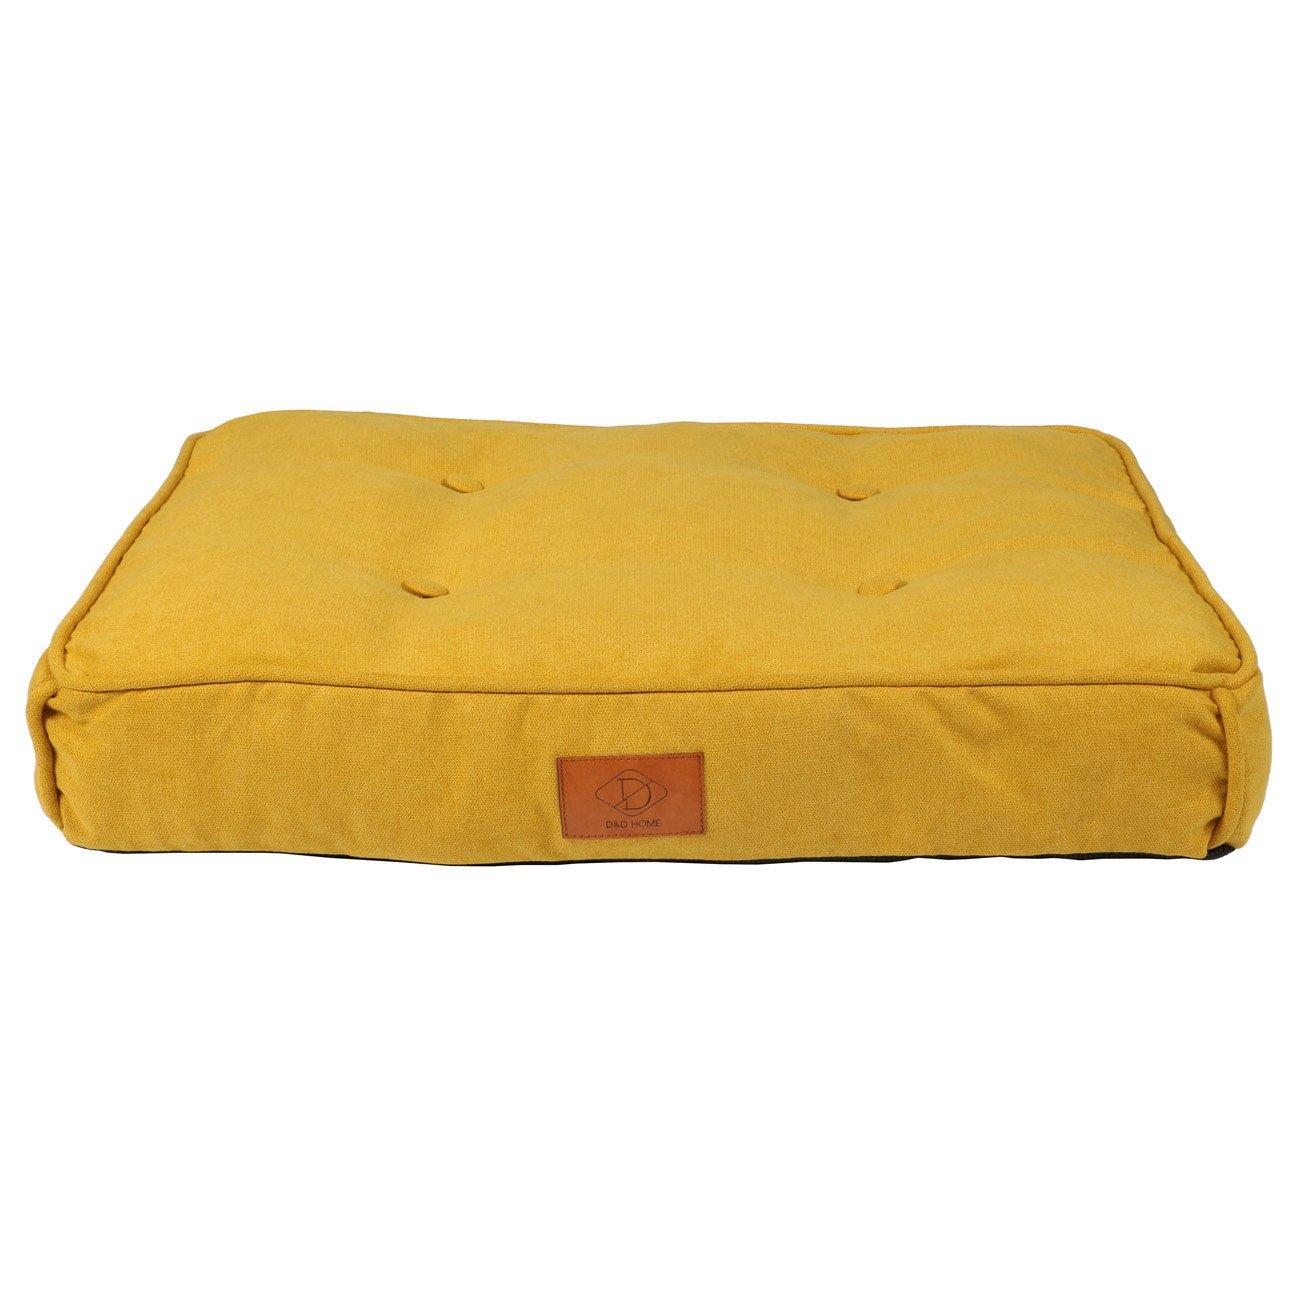 EBI Retro Hundekissen Eve im Chesterfield-Look, M, 70 x 50 x 12 cm, gelb